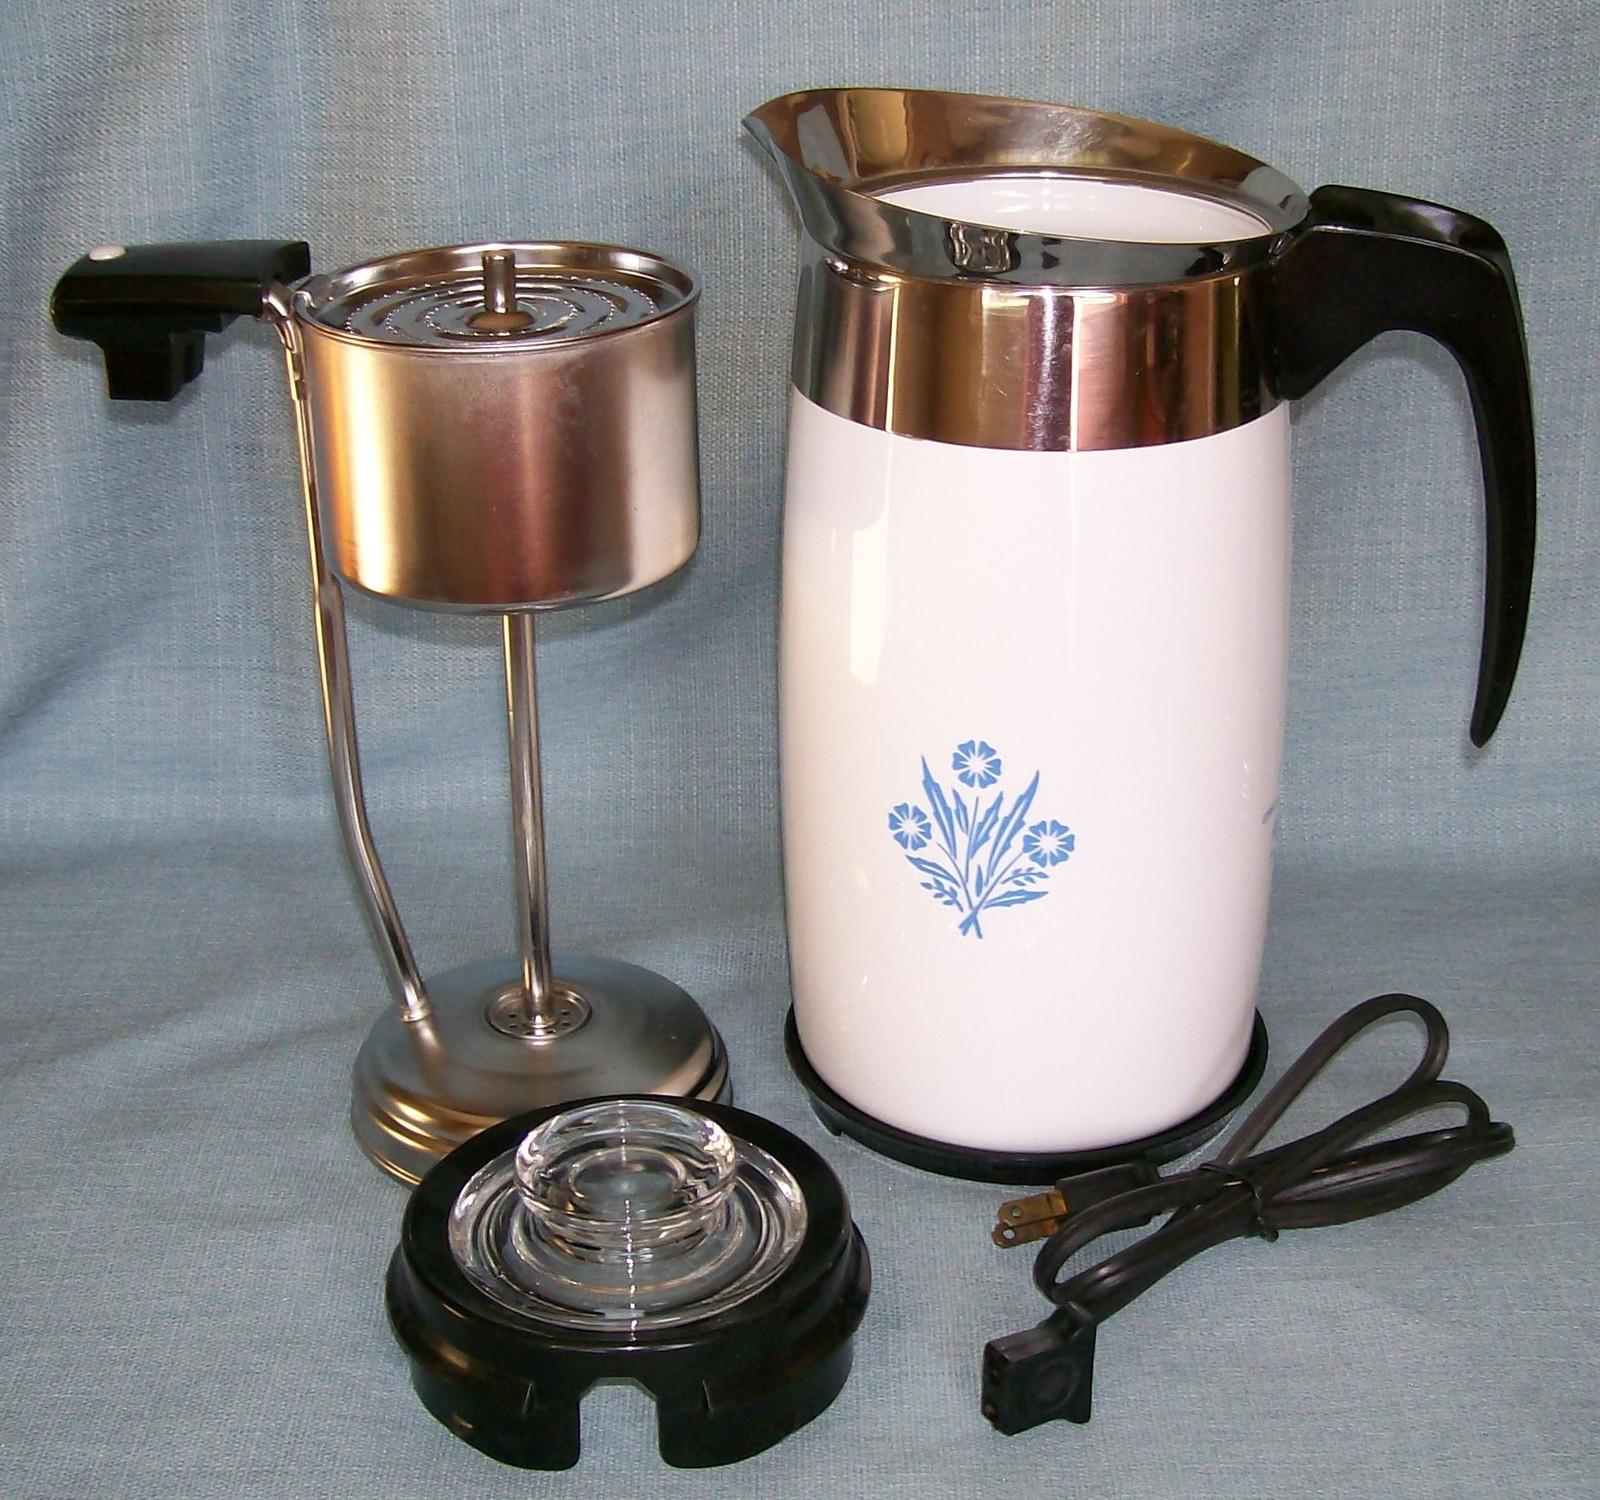 Corning Ware BLUE CORNFLOWER Electric Coffee Pot/Percolator 10 cup P-80-EP EUVC image 2